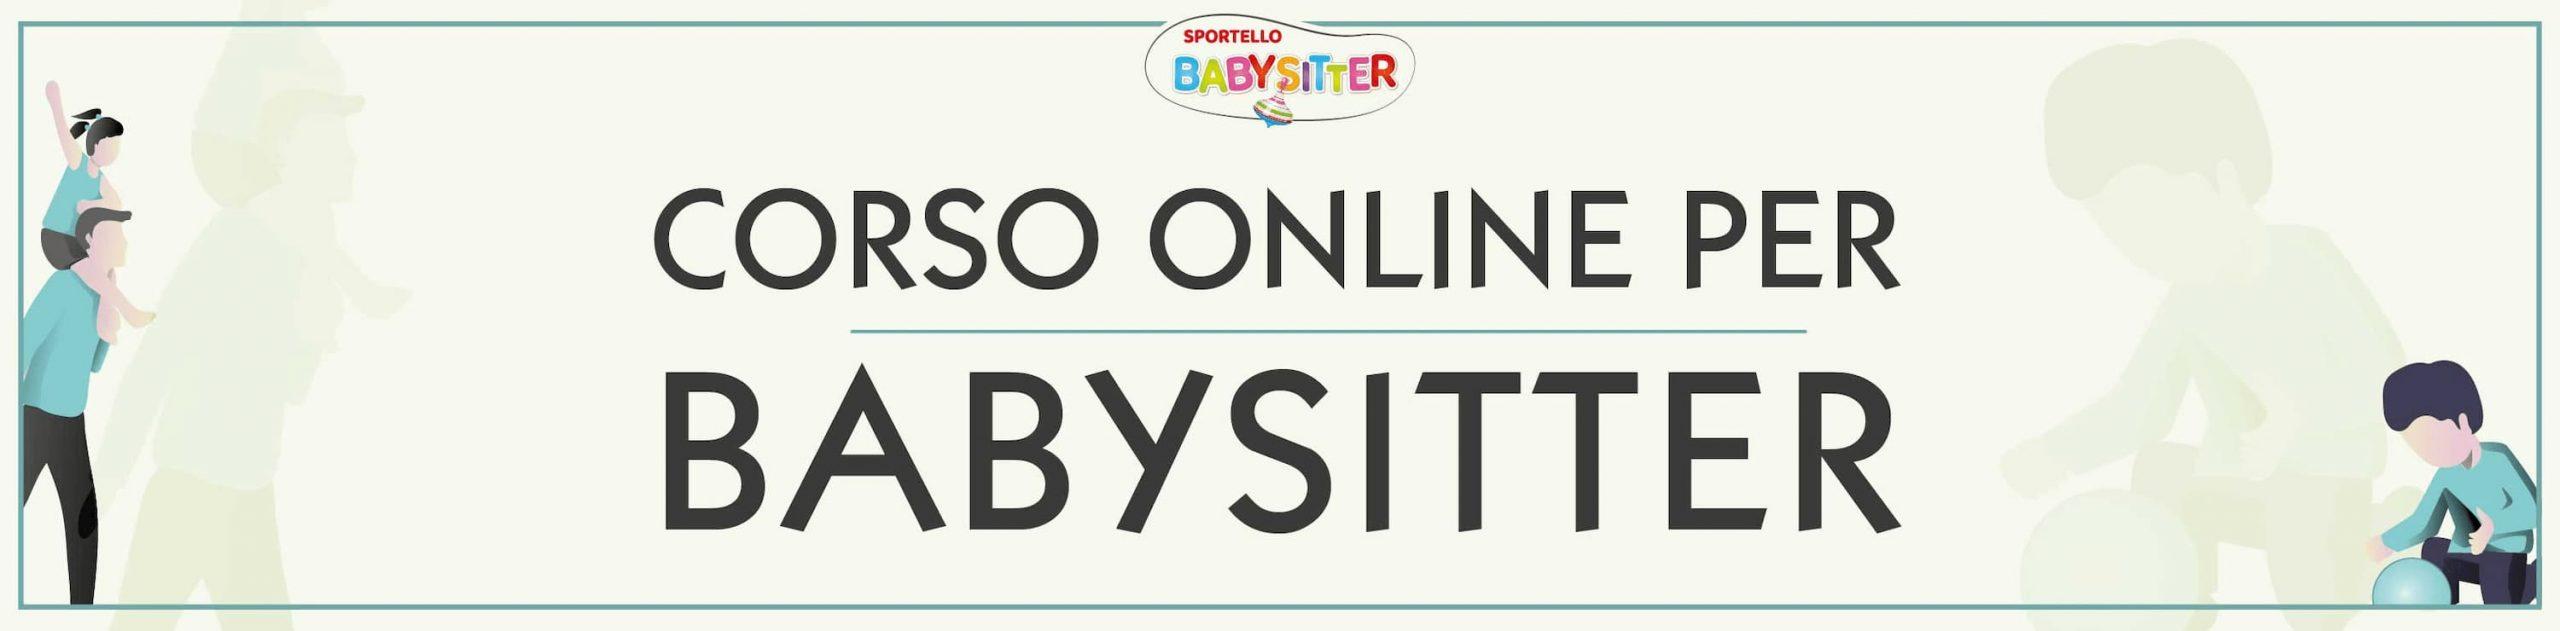 corso online per babysitter